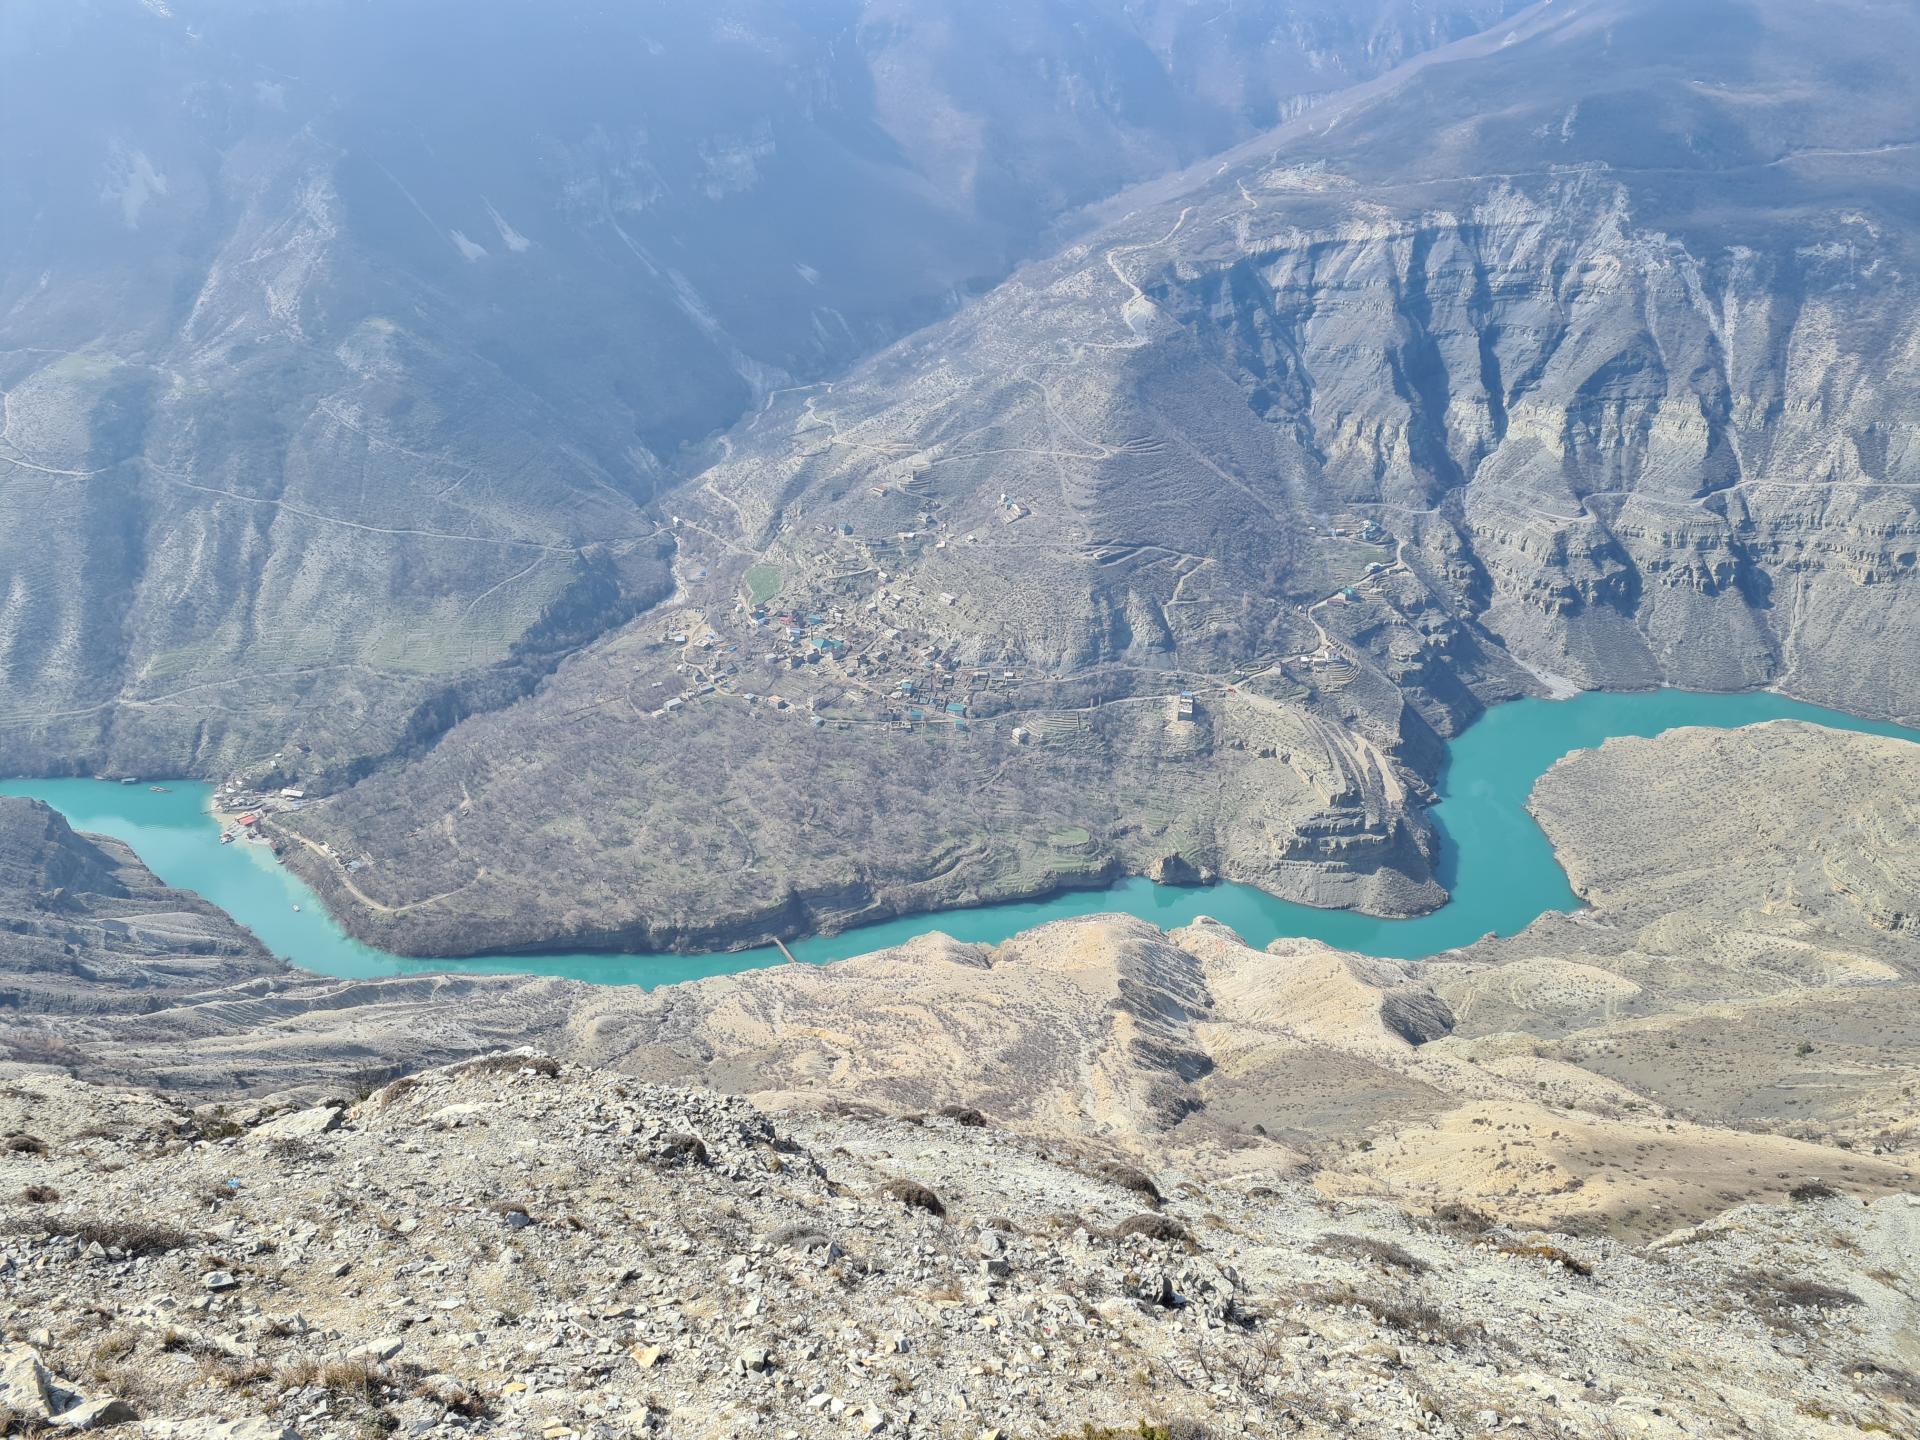 аул Зубутли в Сулакском каньоне